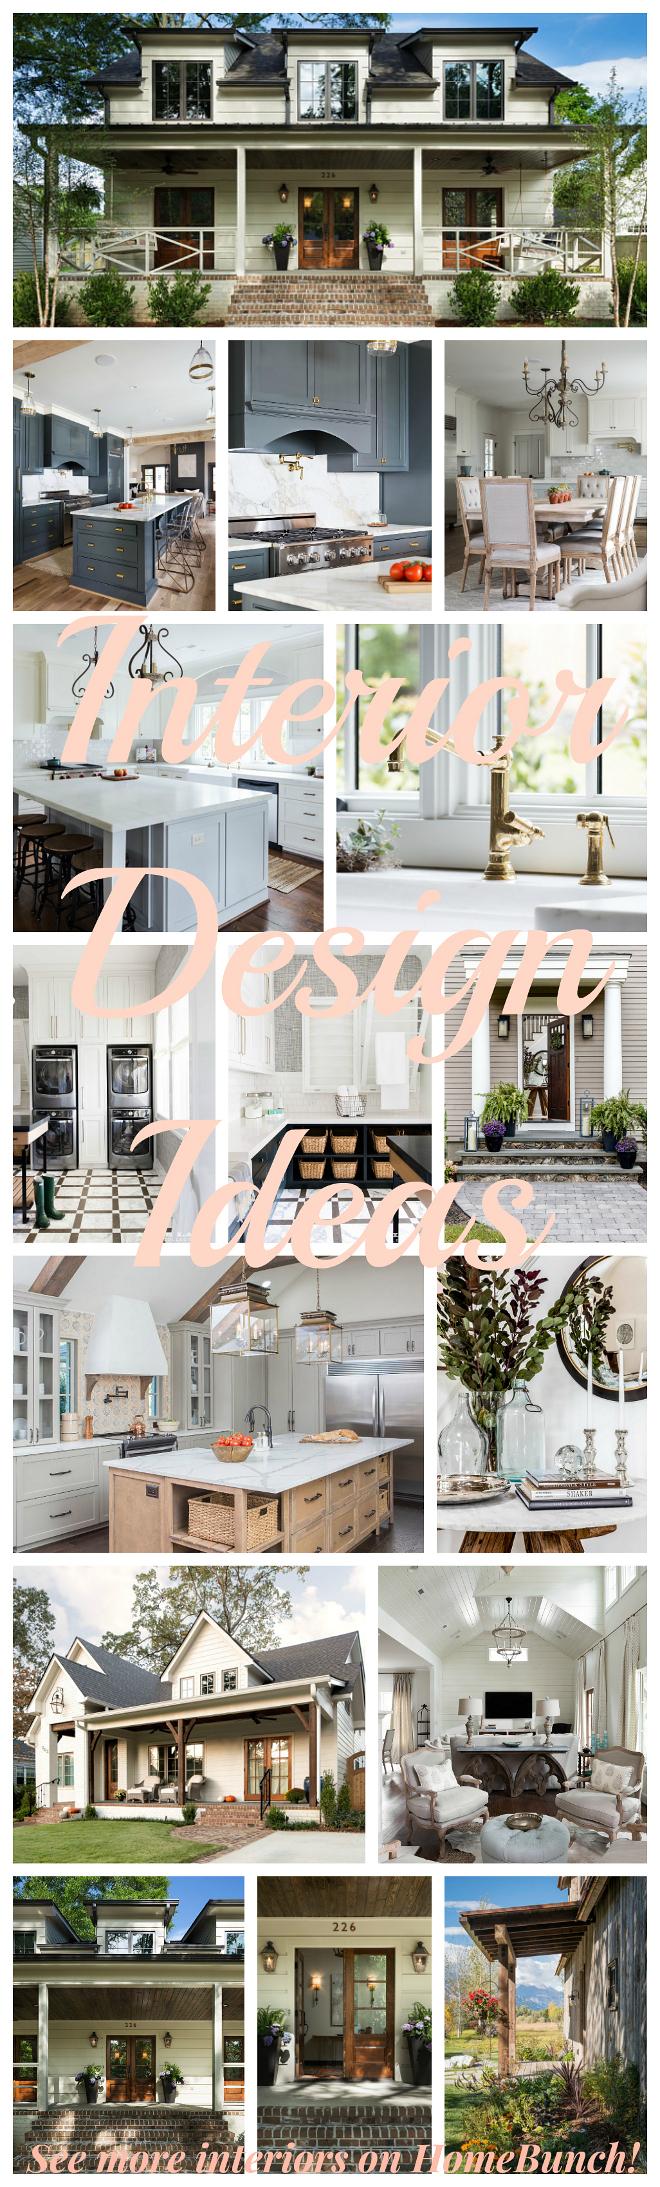 Interior Design Ideas. Home Bunch Blog weekly series showcasing the lastest interior design trends. Interior Design Ideas #InteriorDesign #InteriorDesignIdeas #blogs